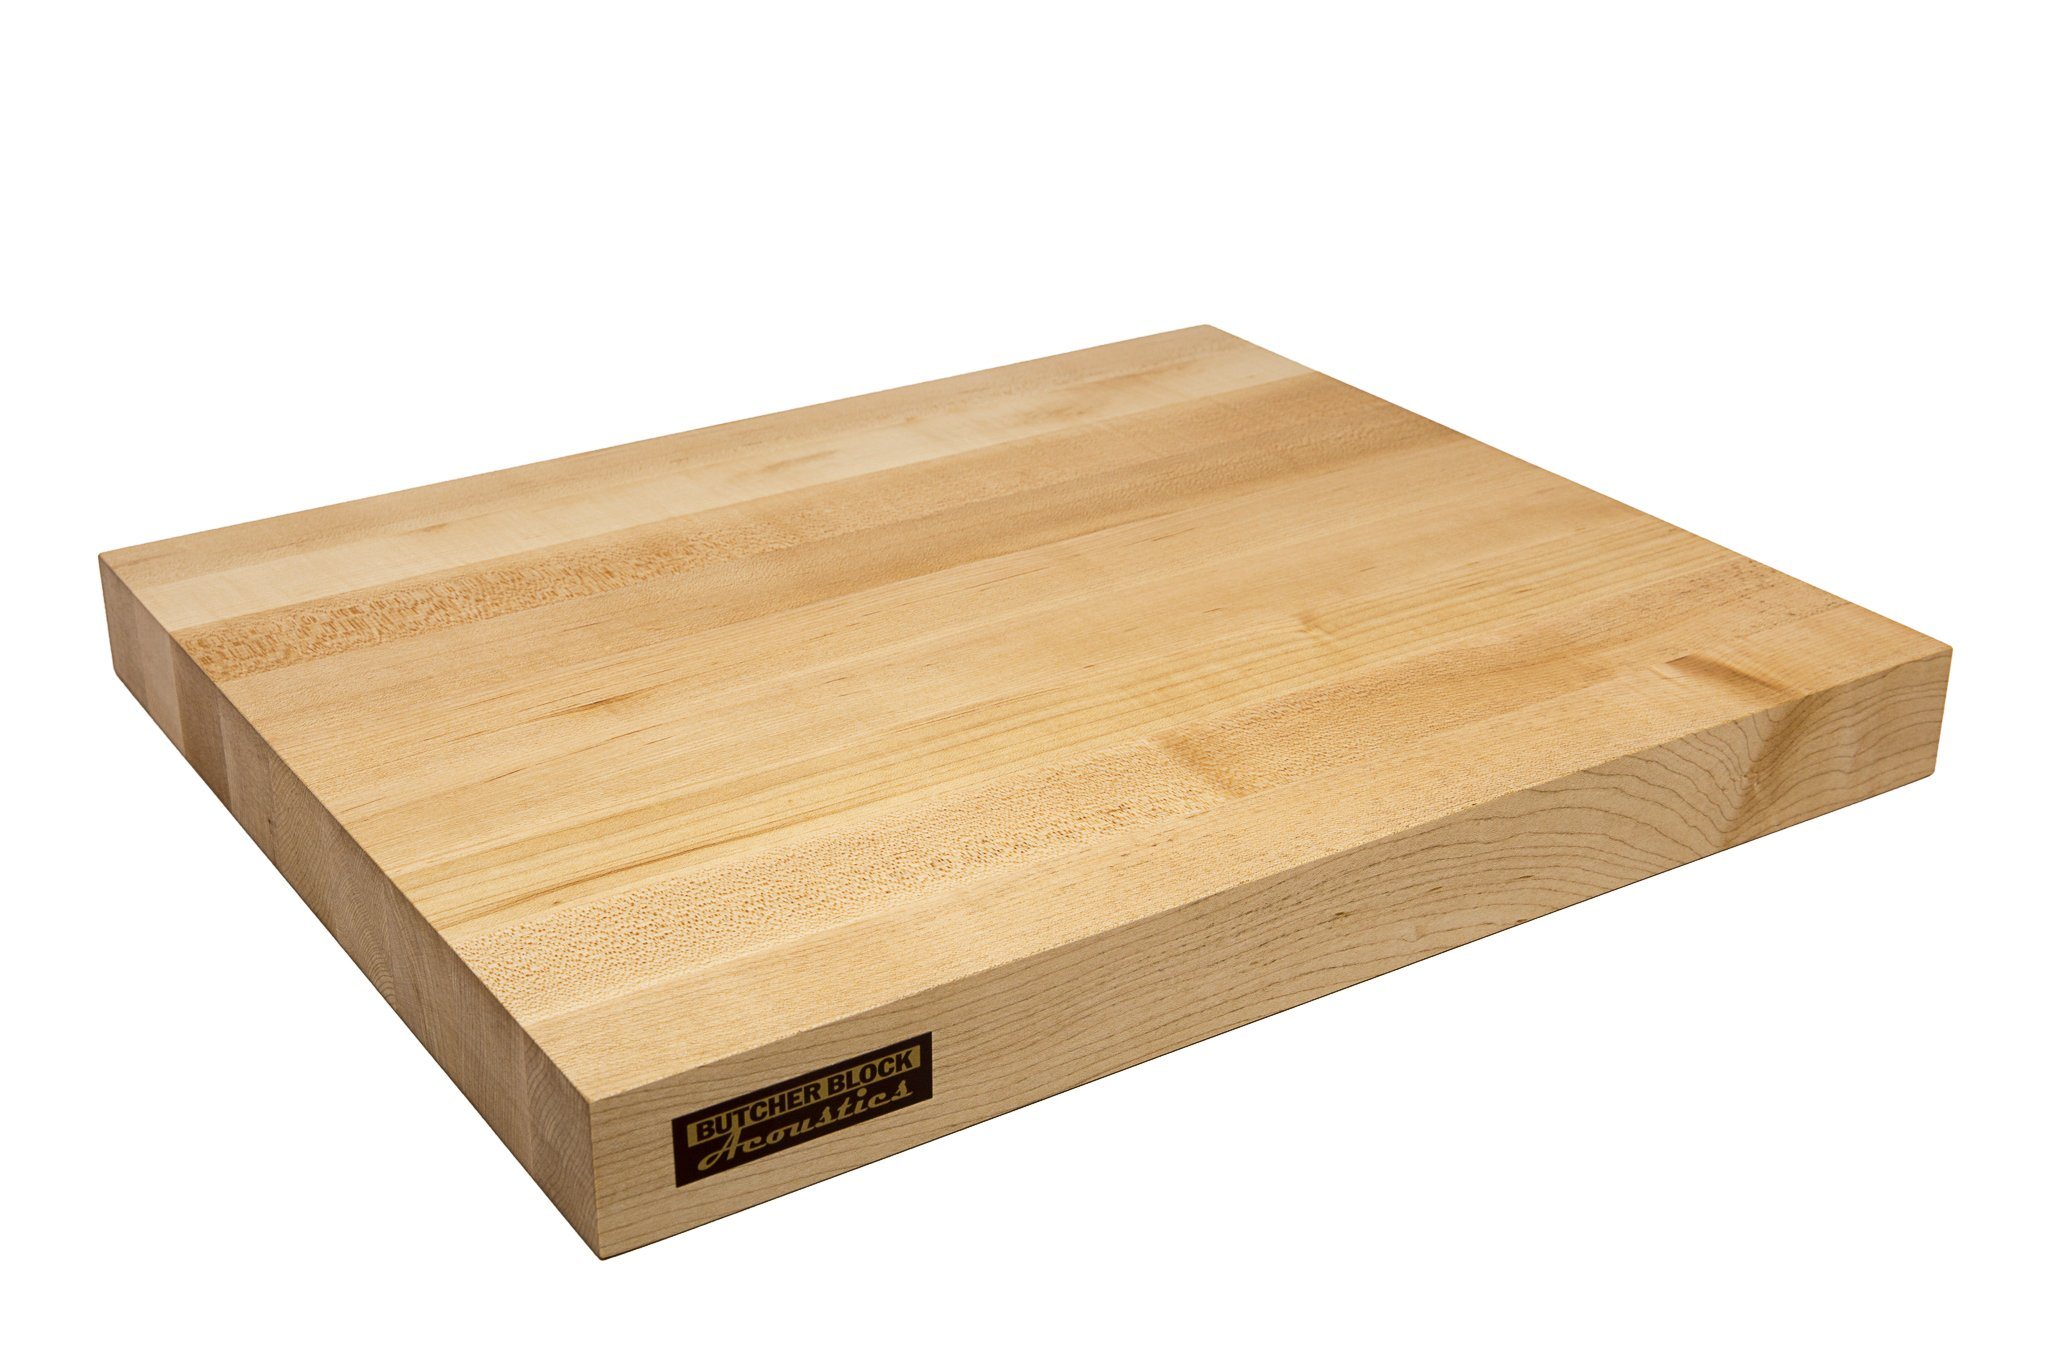 Butcher Block Acoustics Audio Isolation Platform - Edge Grain (17'' x 14'' x 1-3/4'', MAPLE)